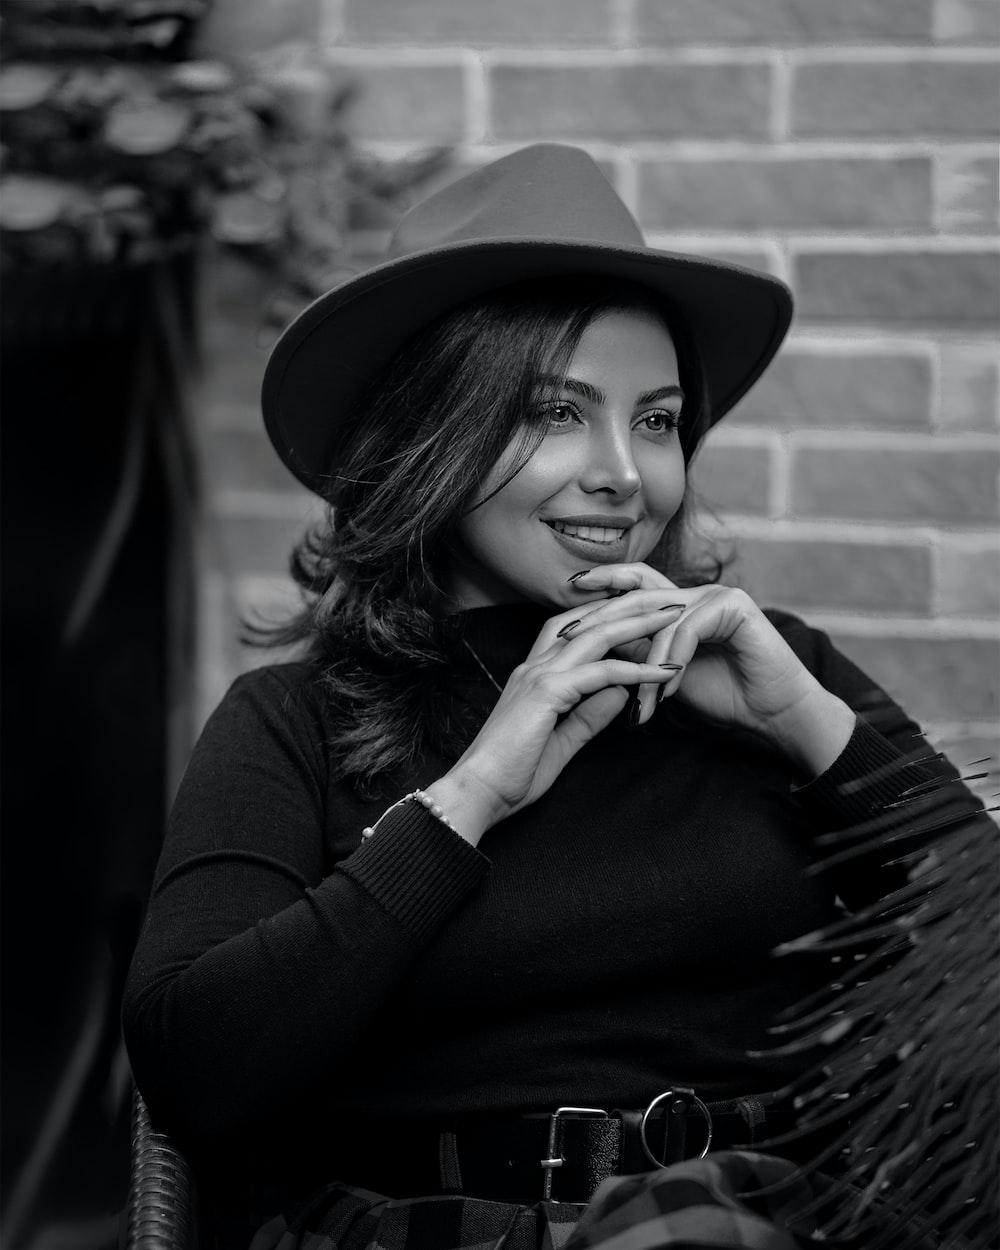 woman in black long sleeve shirt wearing black hat